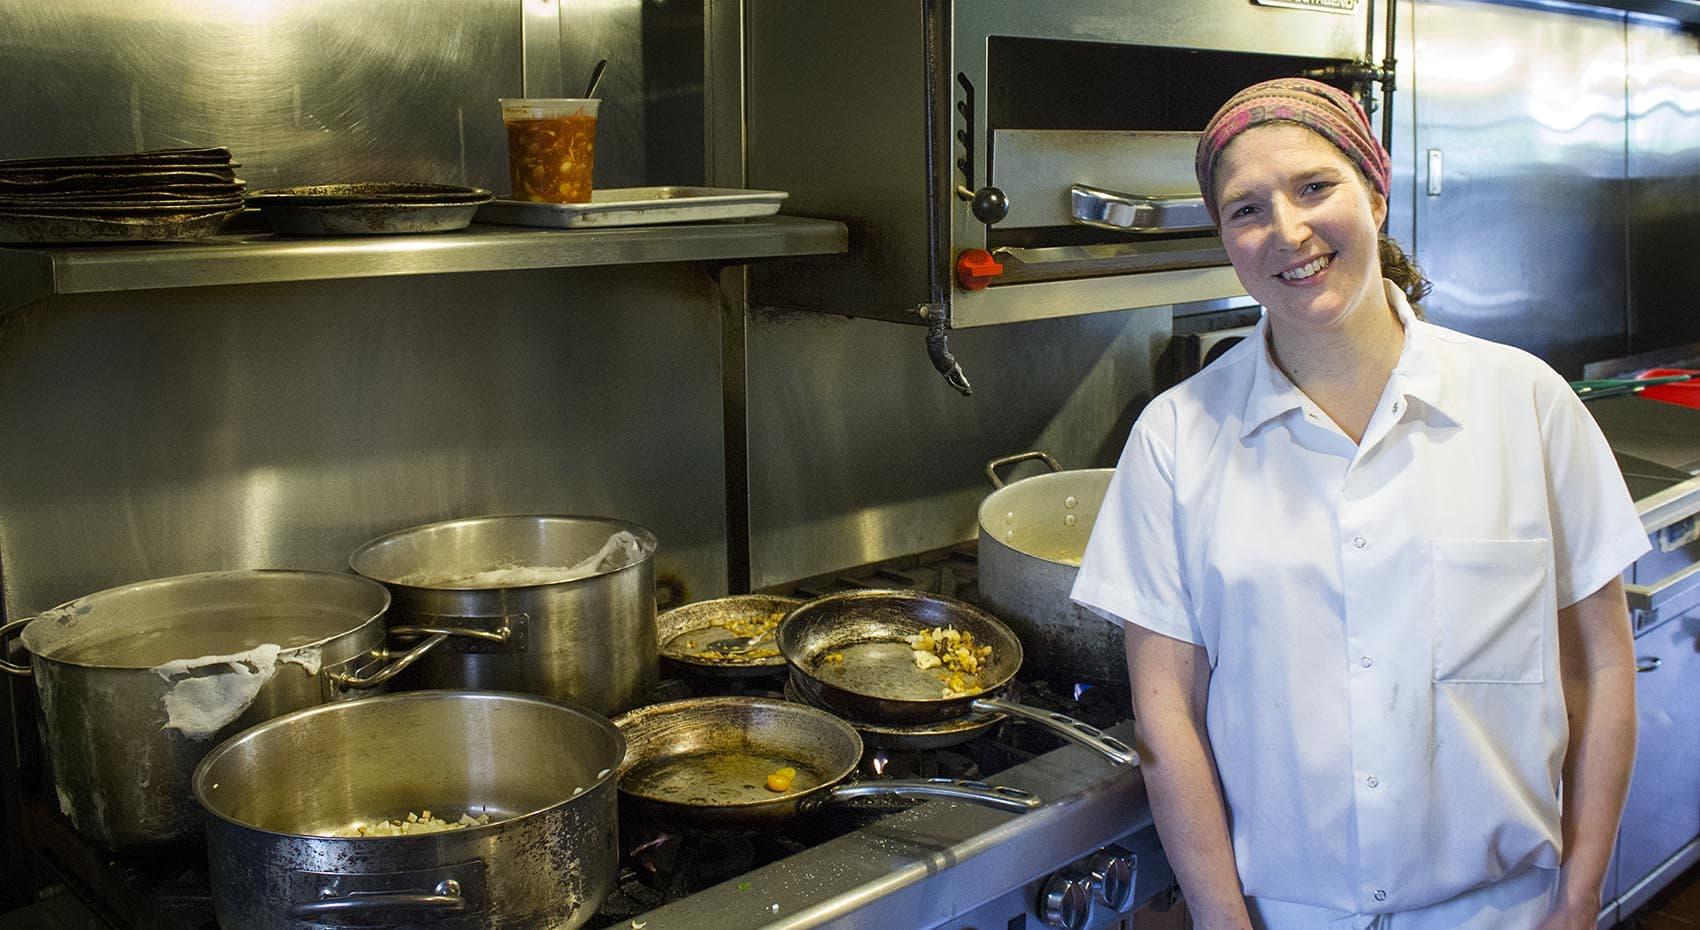 Cassie Piuma in the kitchen of Sarma. (Alison Bruzek/WBUR)